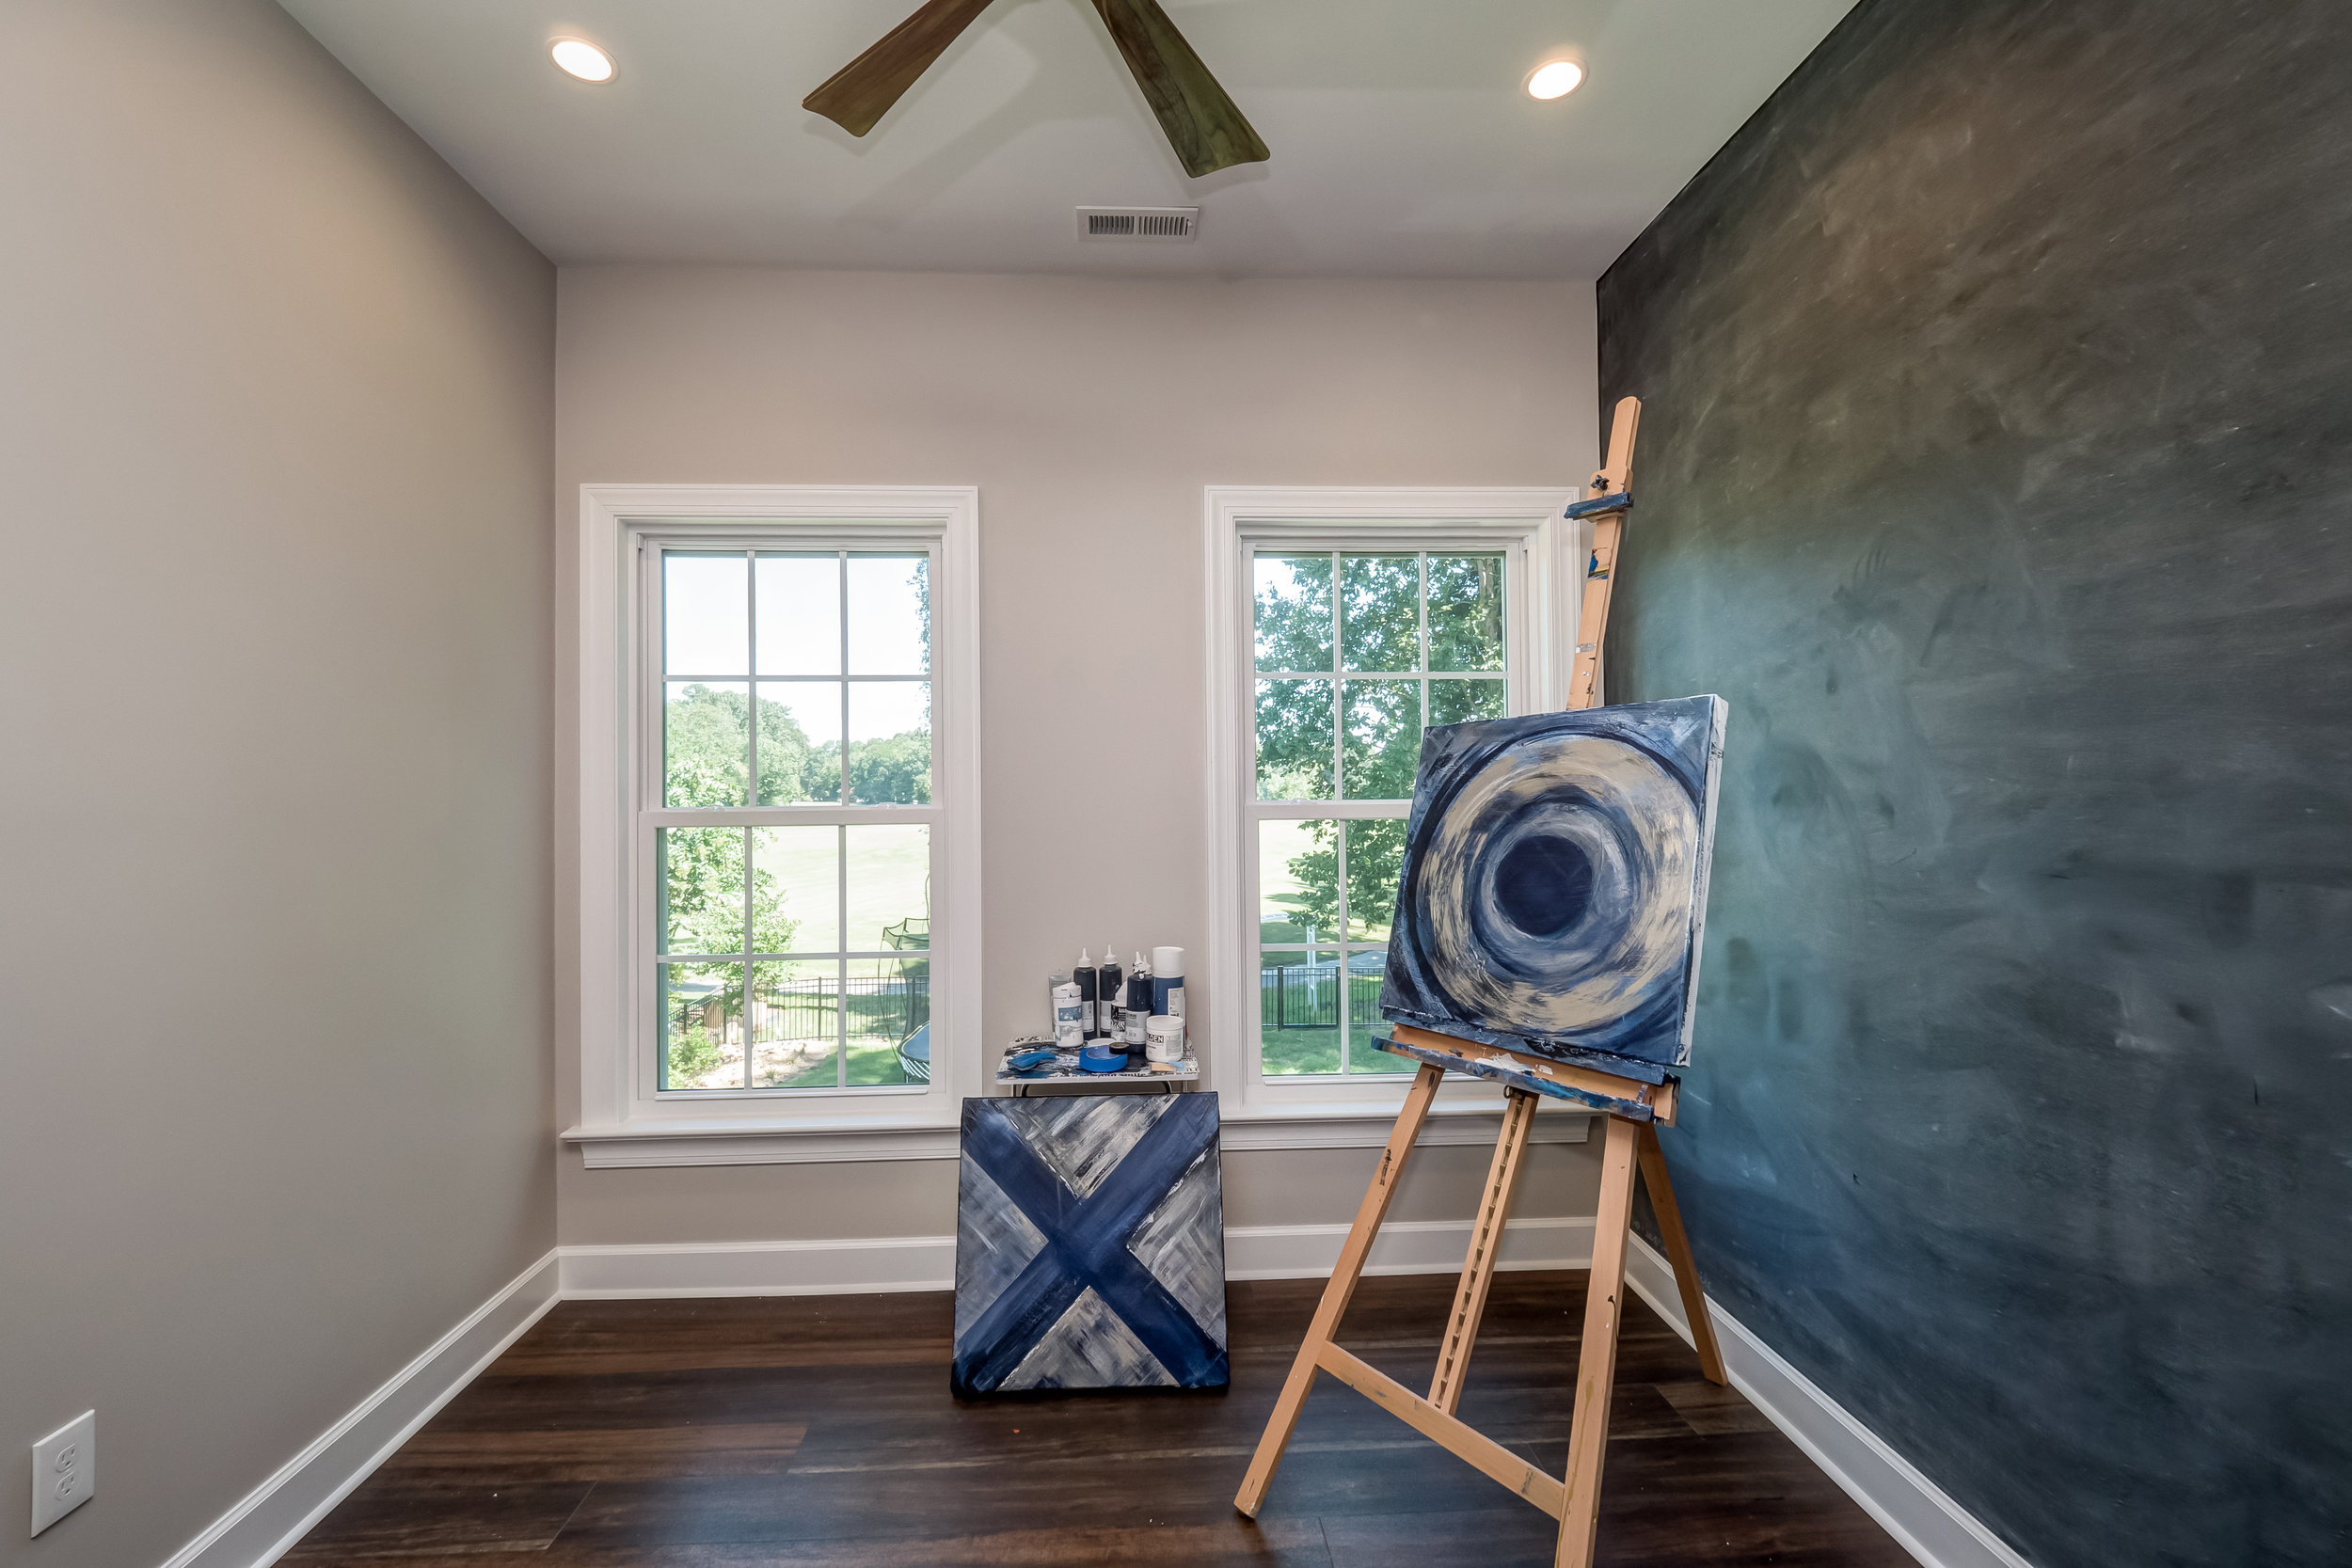 art room remodel hampton roads benson homes chesapeake va.jpg